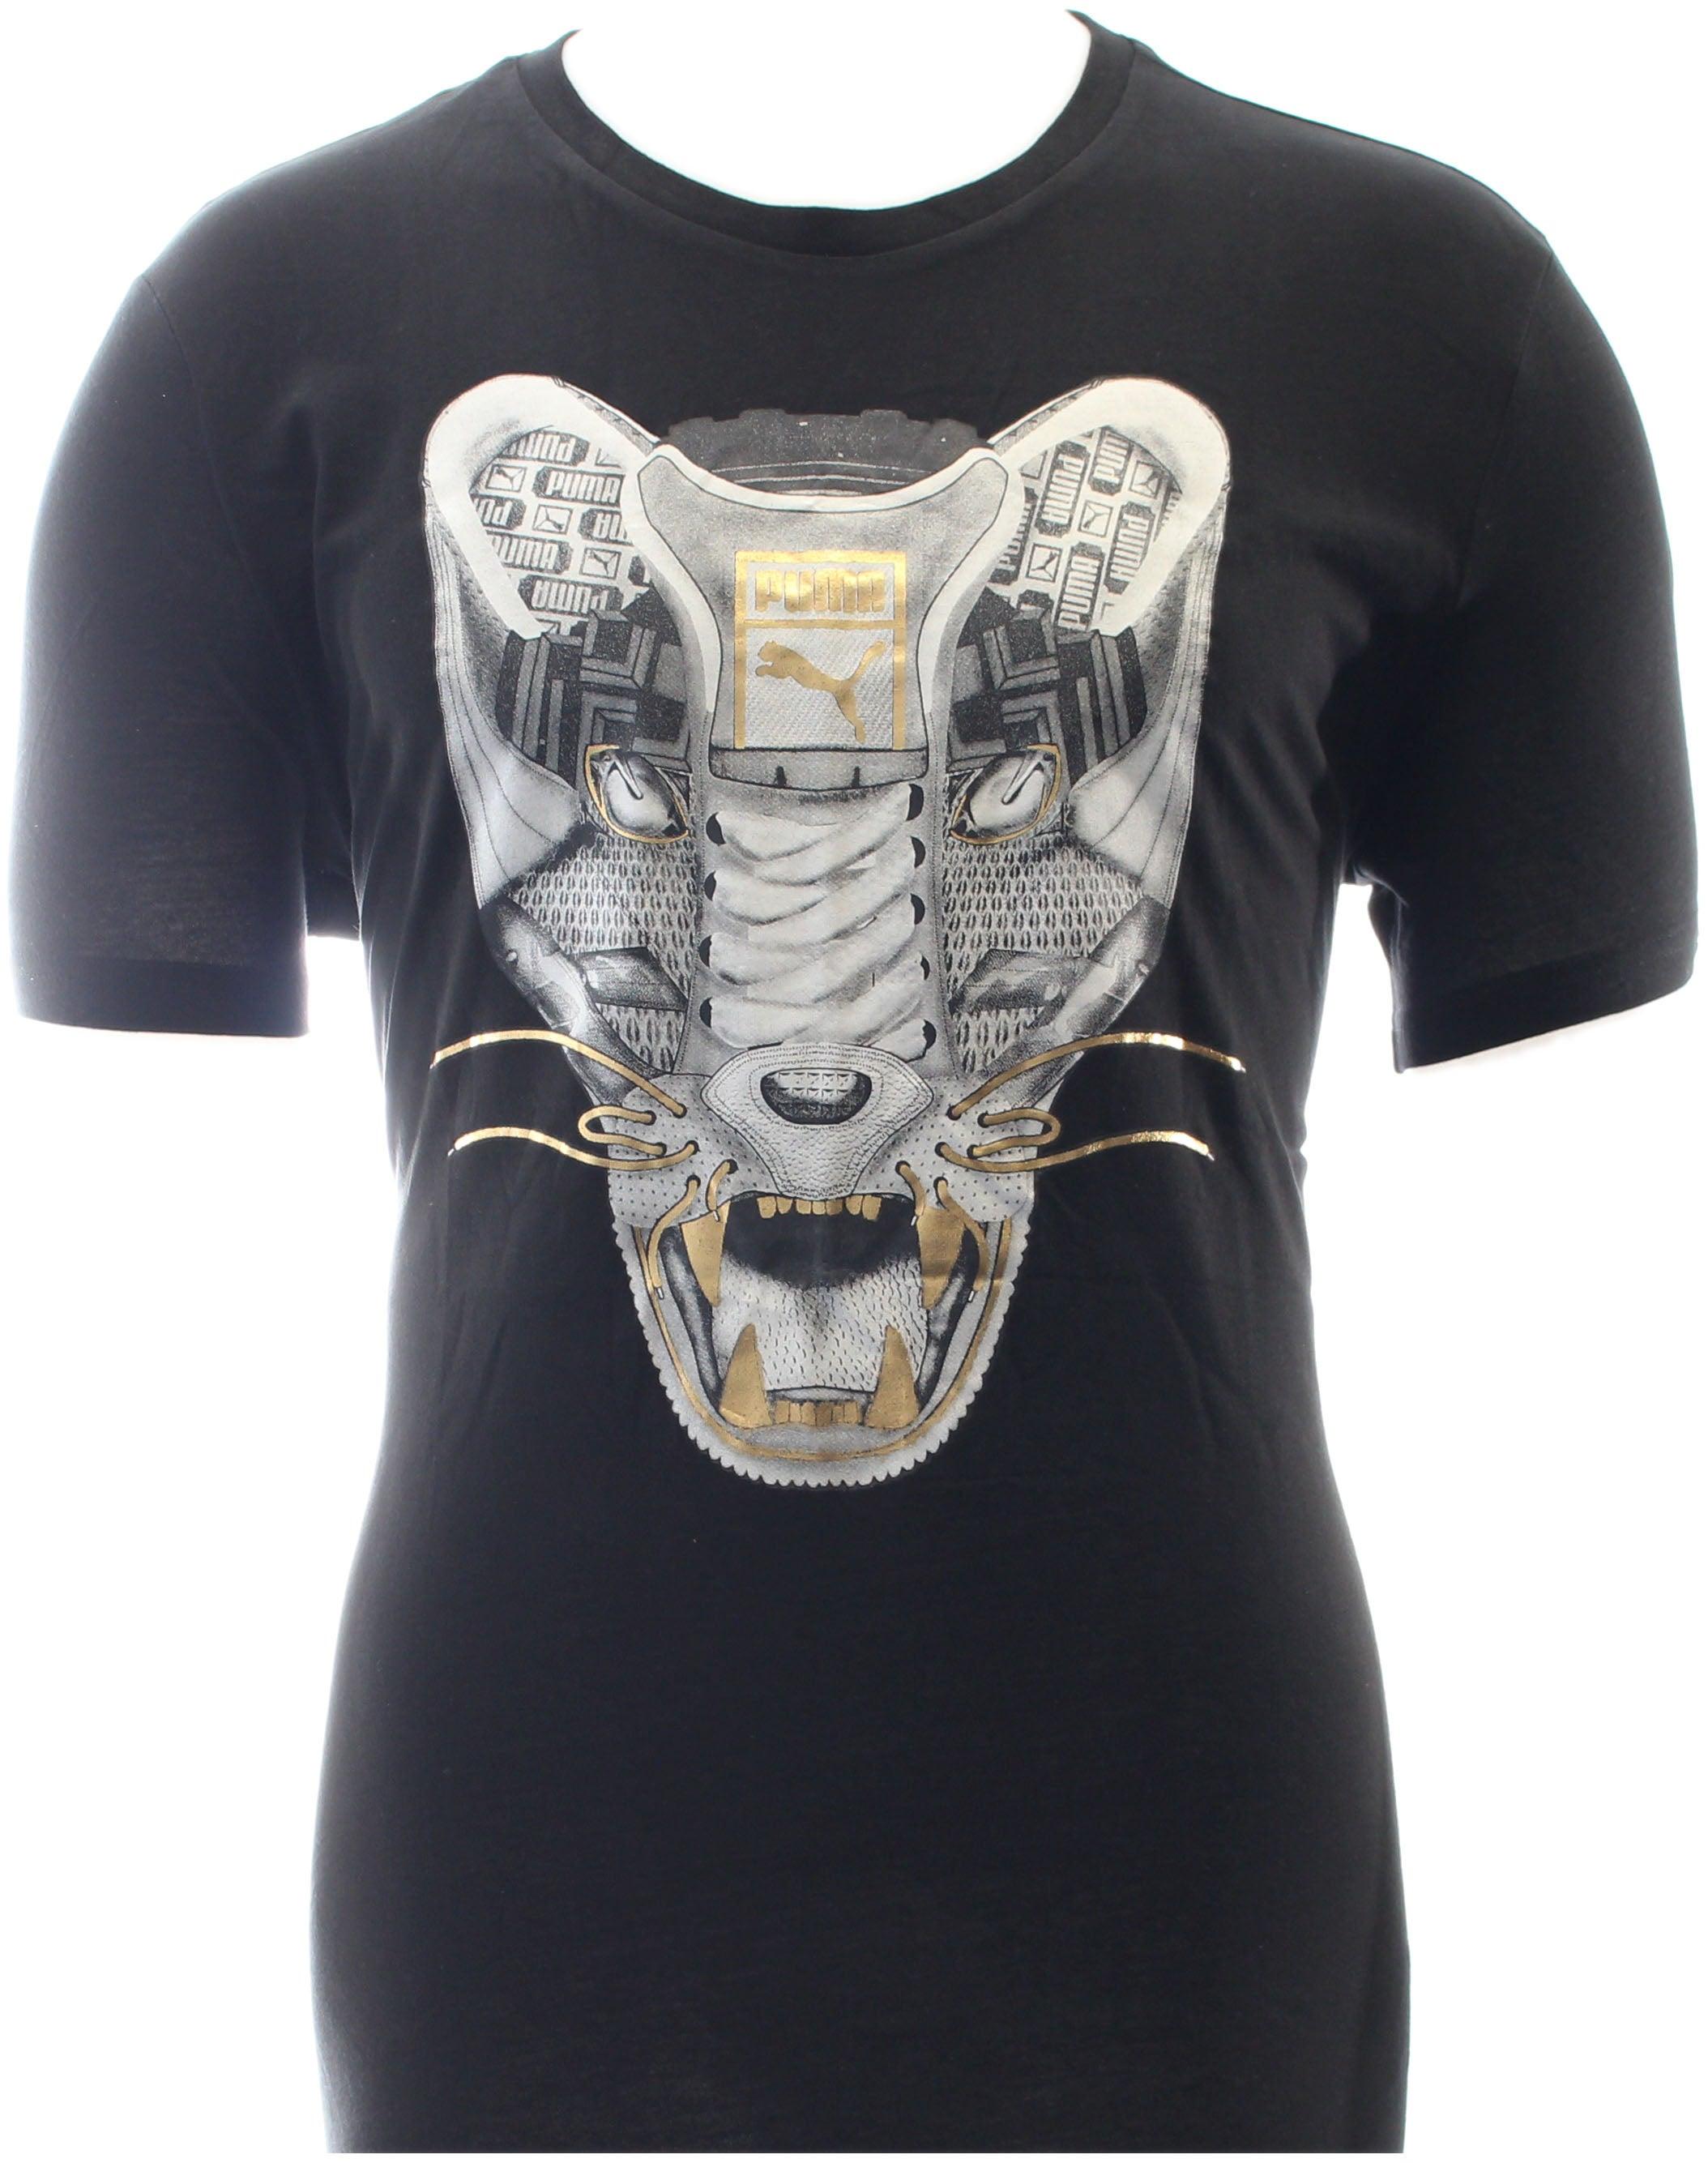 Puma Sneaker Tee 3 Black - Mens  - Size